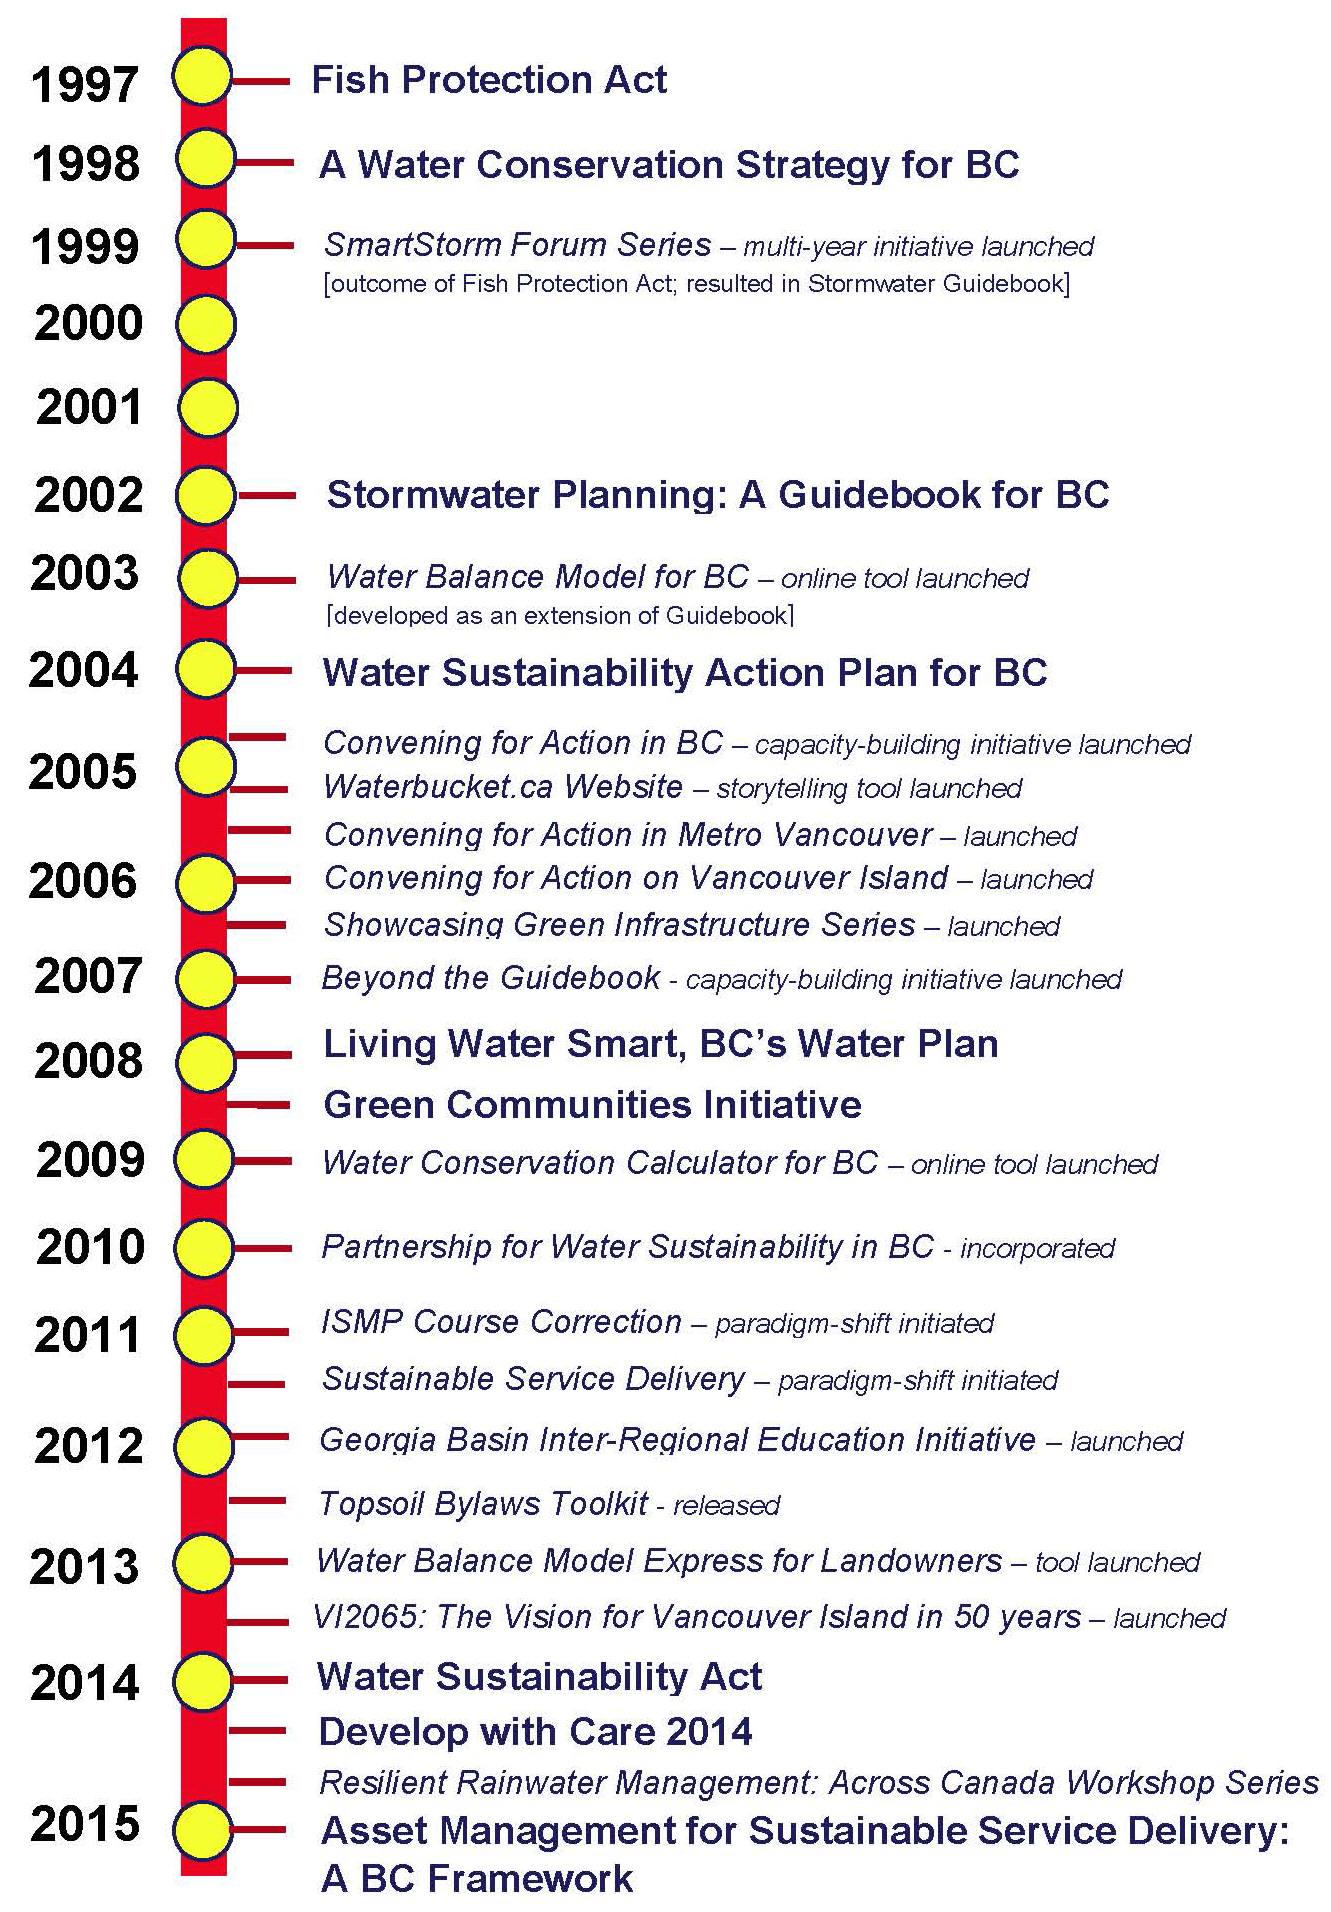 BYGB2015_Timeline_overall_Aug2015_rev2